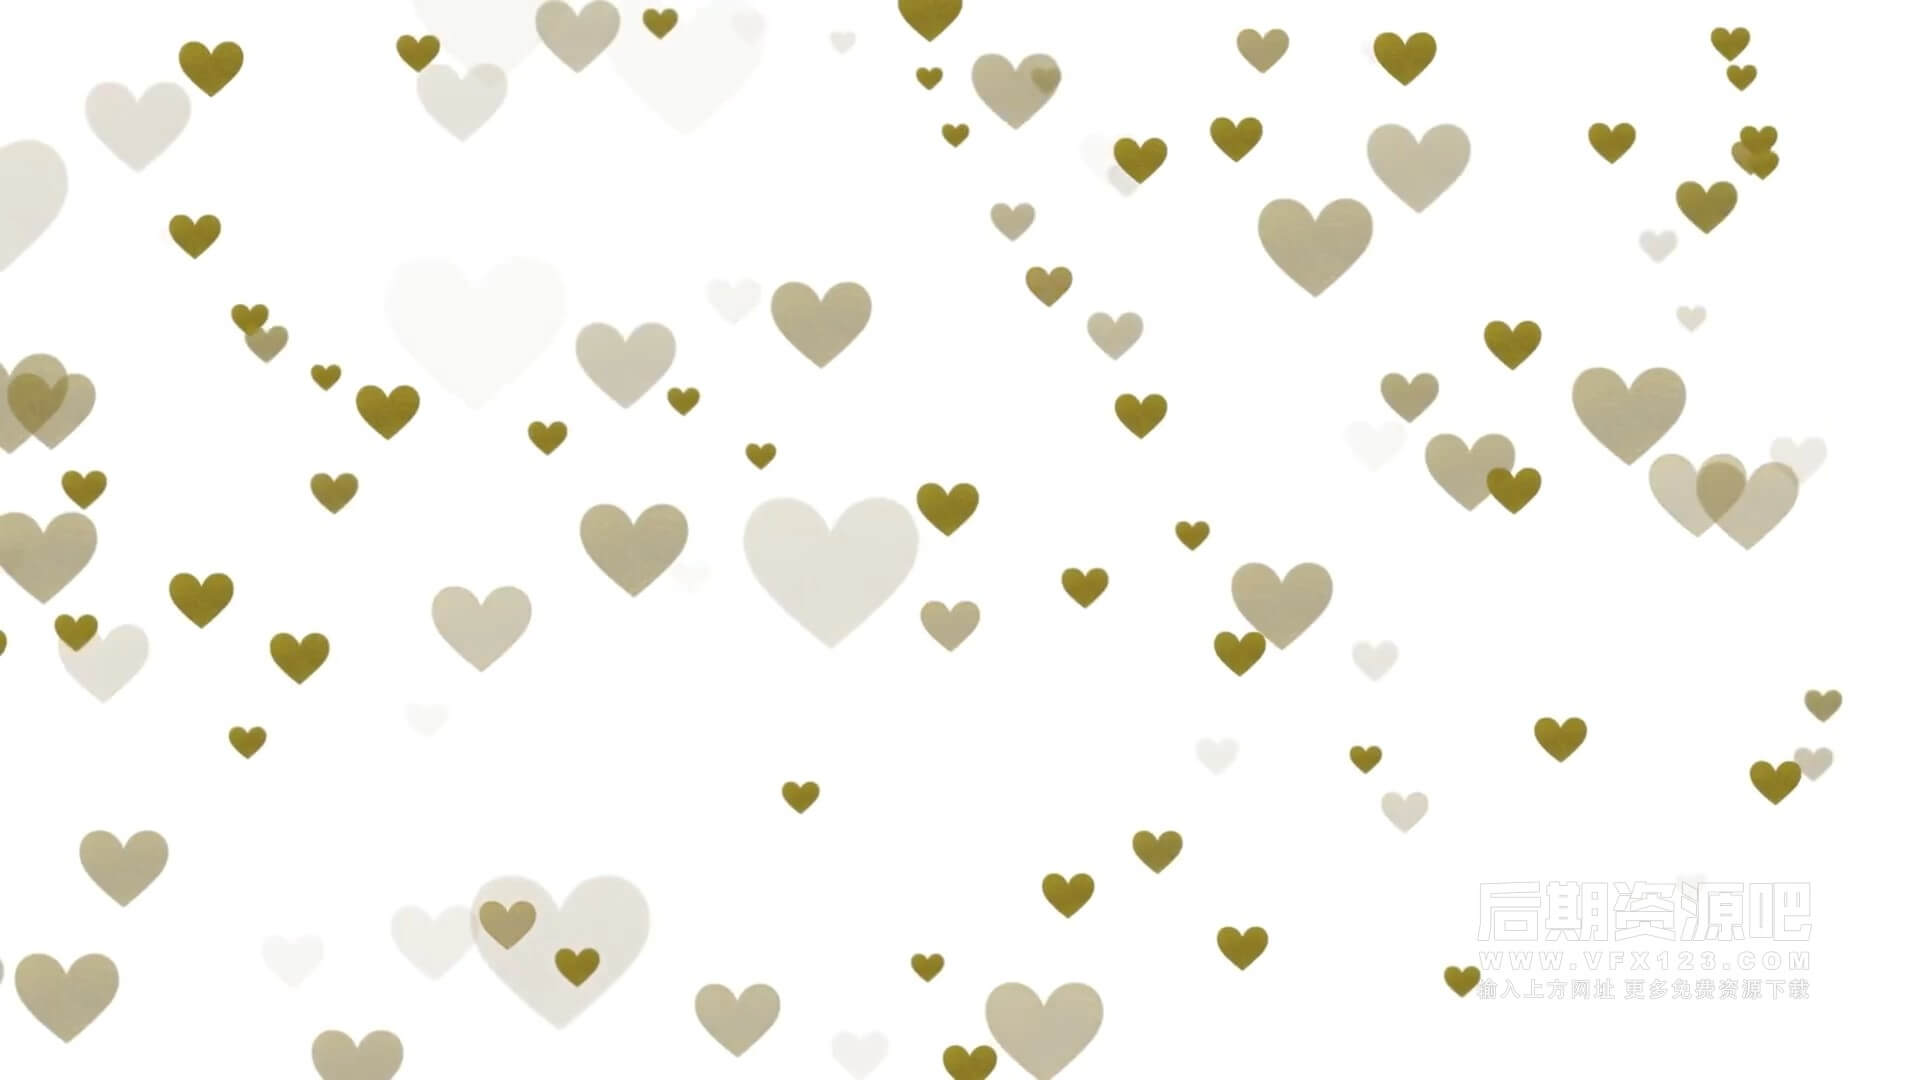 fcpx插件 10种金色纹理标题桃心背景标签等 小清新Vlog常用素材